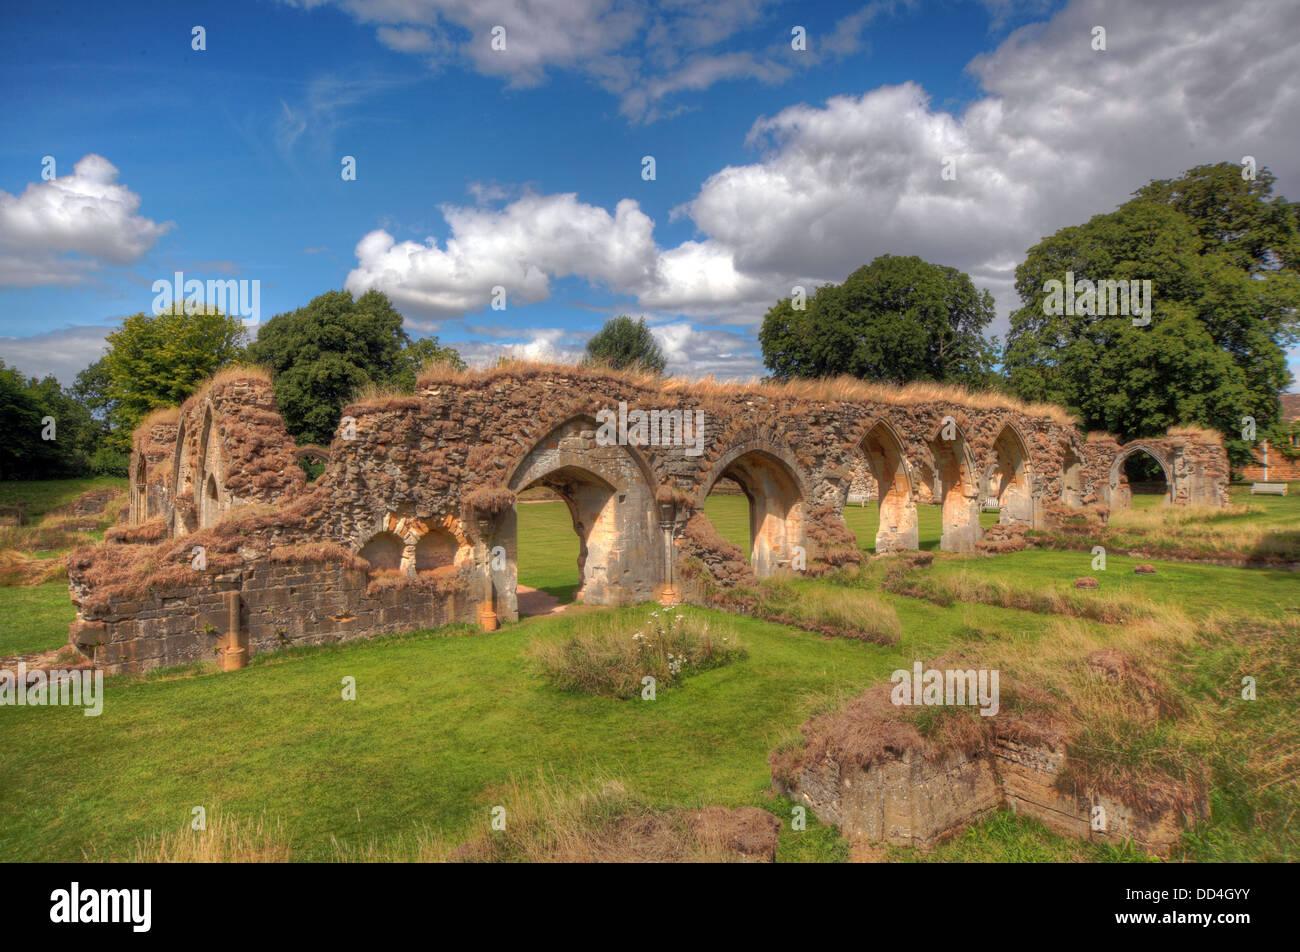 Laden Sie dieses Alamy Stockfoto Hailes Zisterzienserabtei, Cheltenham, Gloucestershire, England, GL54 5PB - DD4GYY